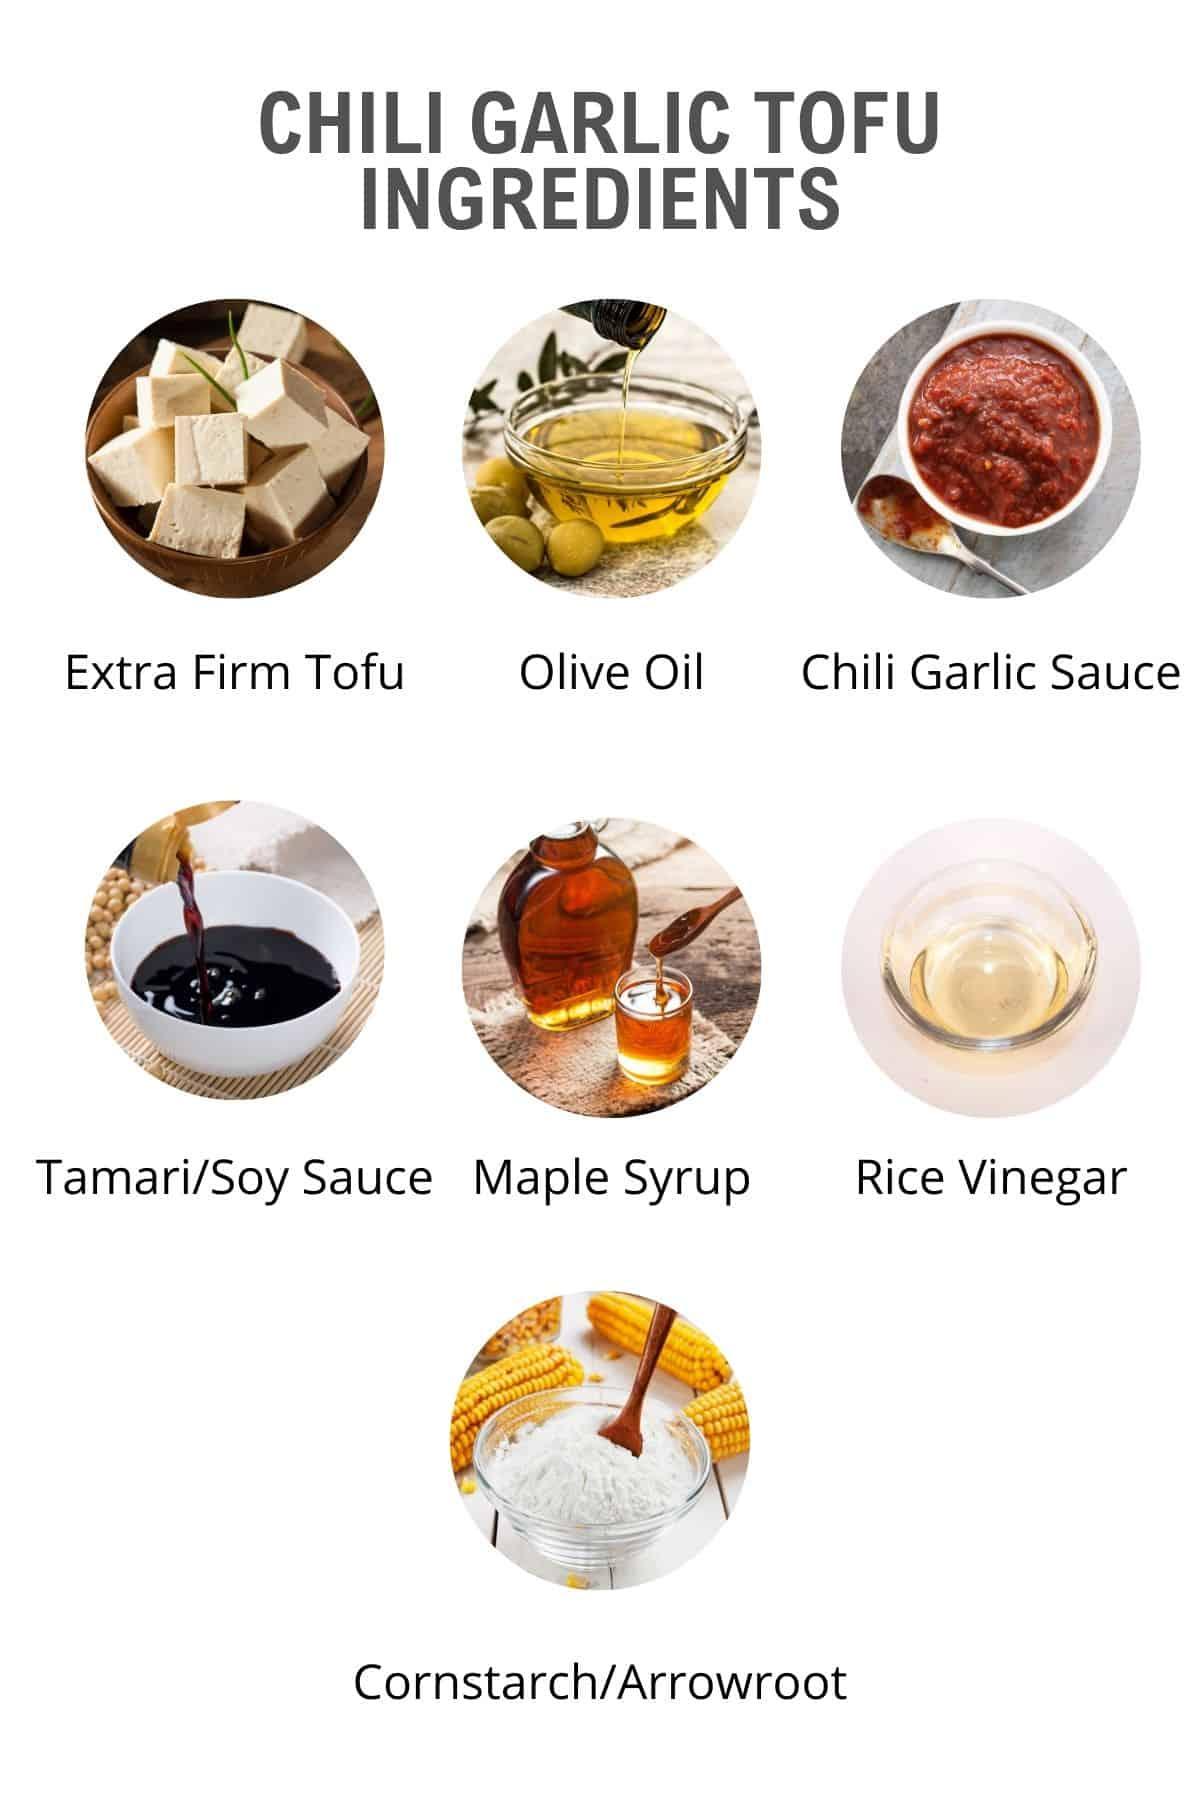 tofu in chili garlic sauce ingredients list